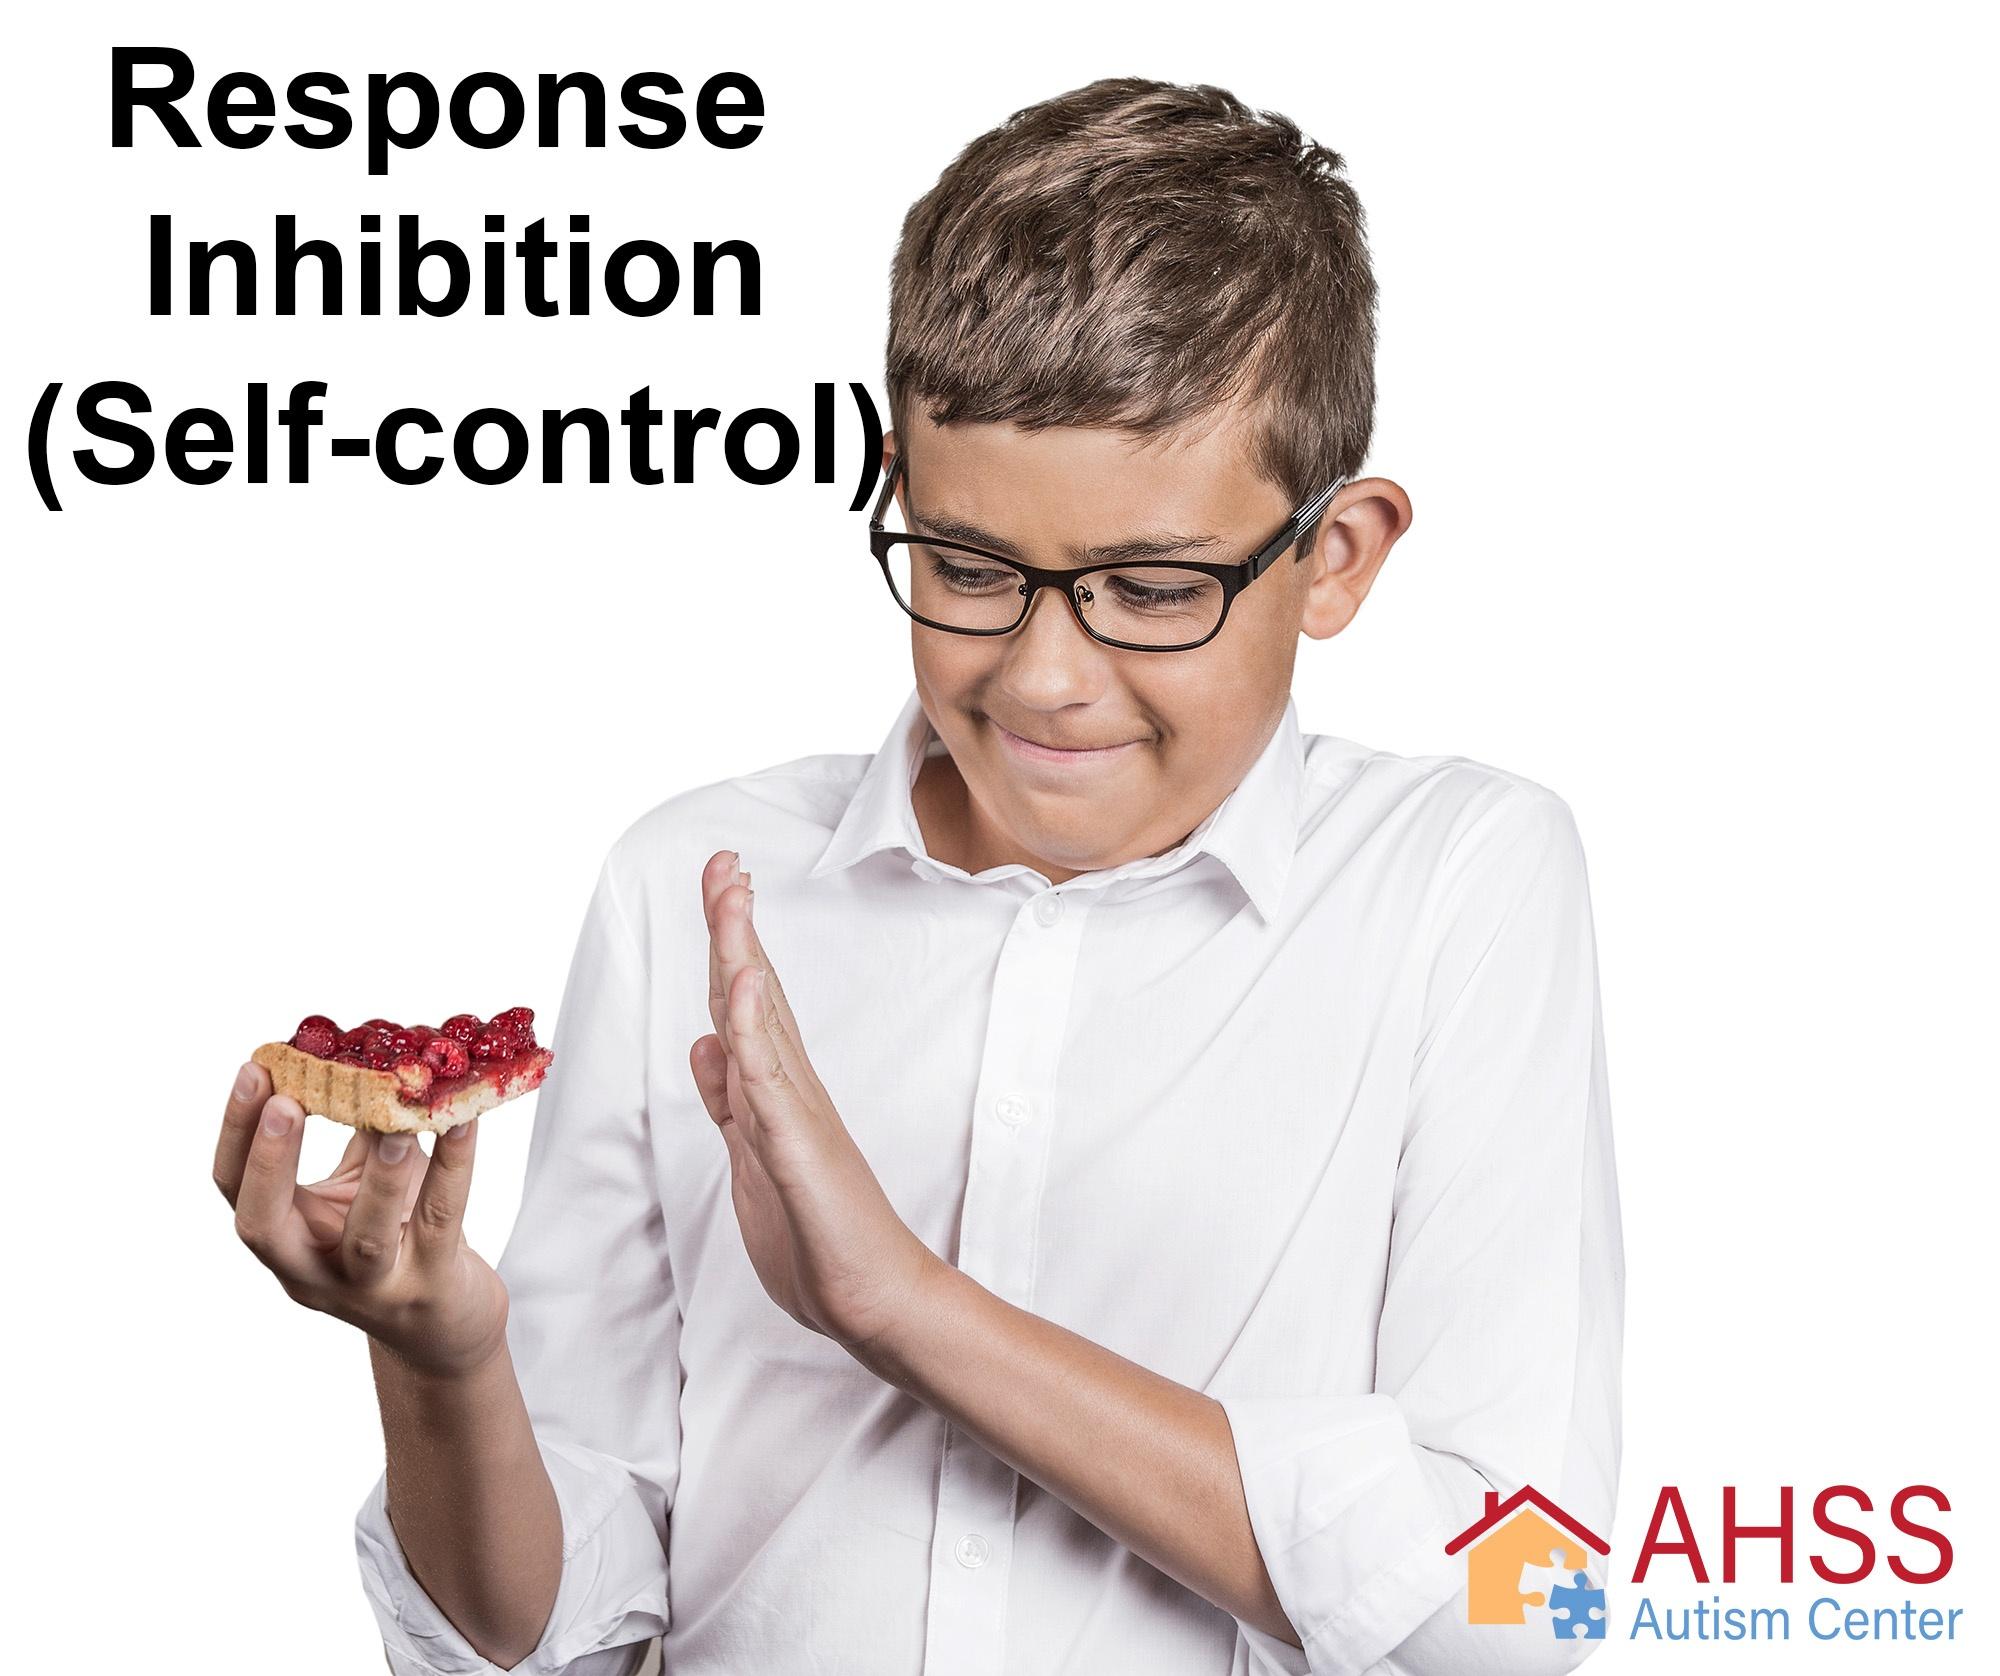 9.14.17 self control boy and dessert RESIZED.jpg